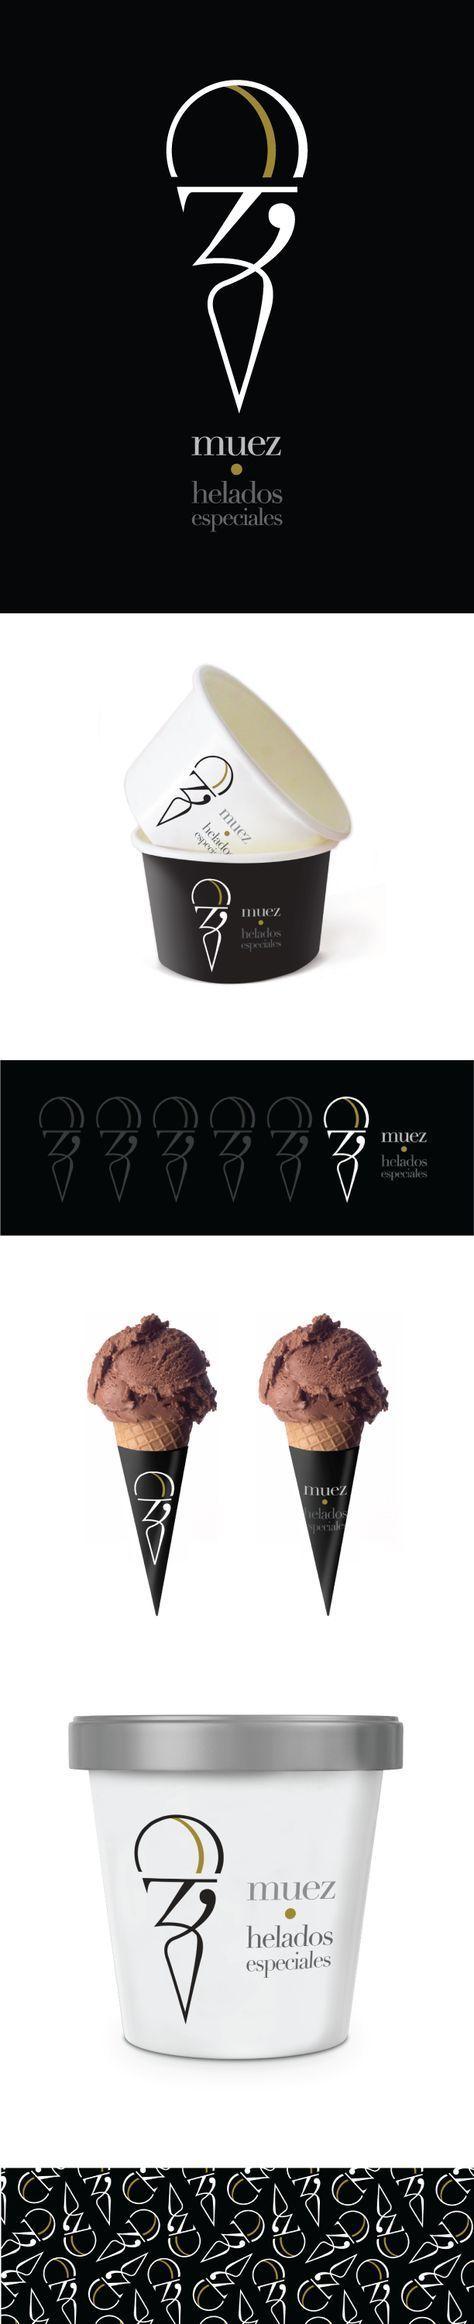 Gelato Branding Packaging Design